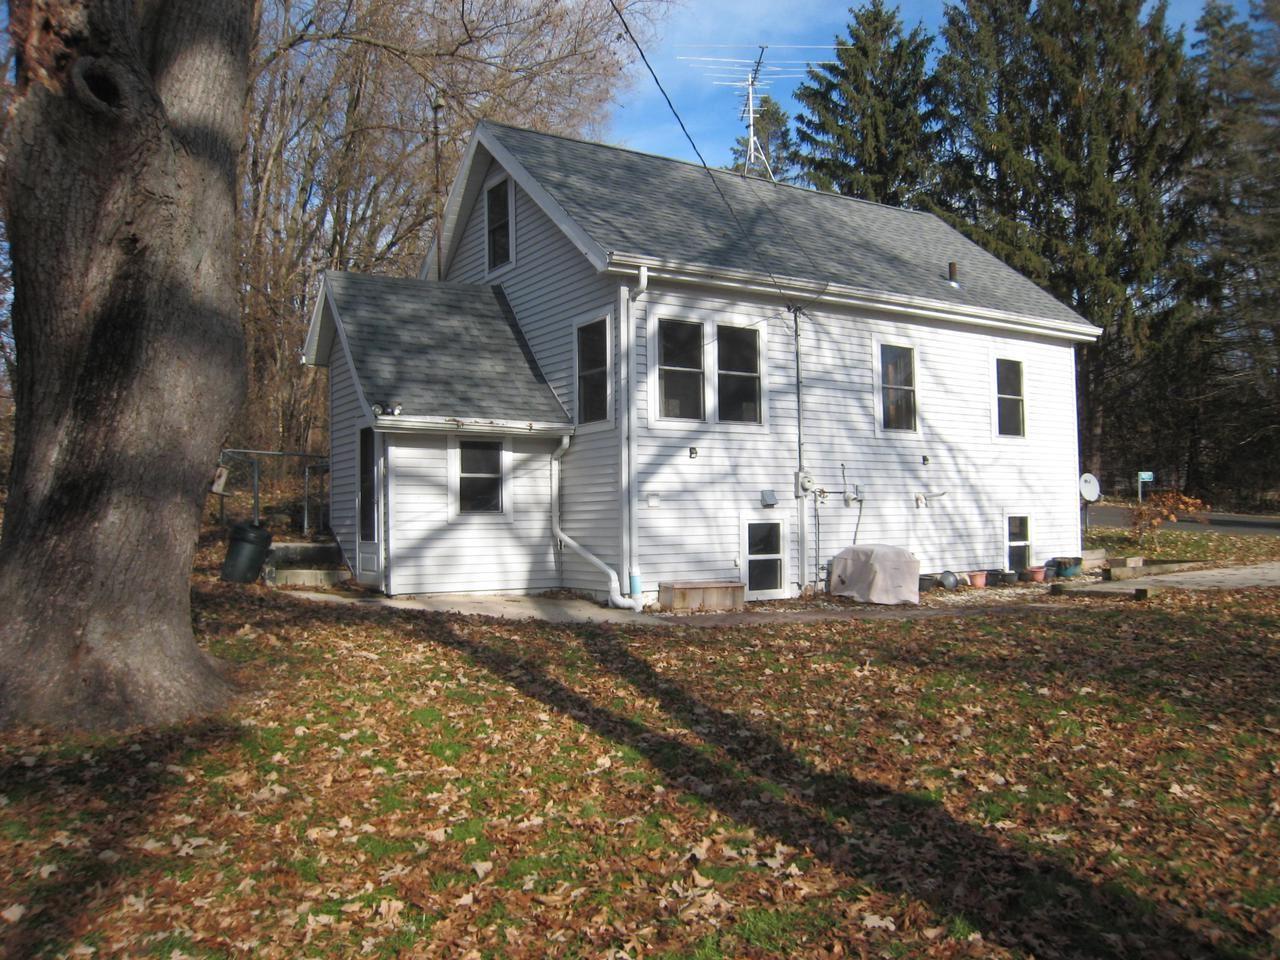 N6927 Oak Ln, Elkhorn, WI 53121 - MLS#: 1668892